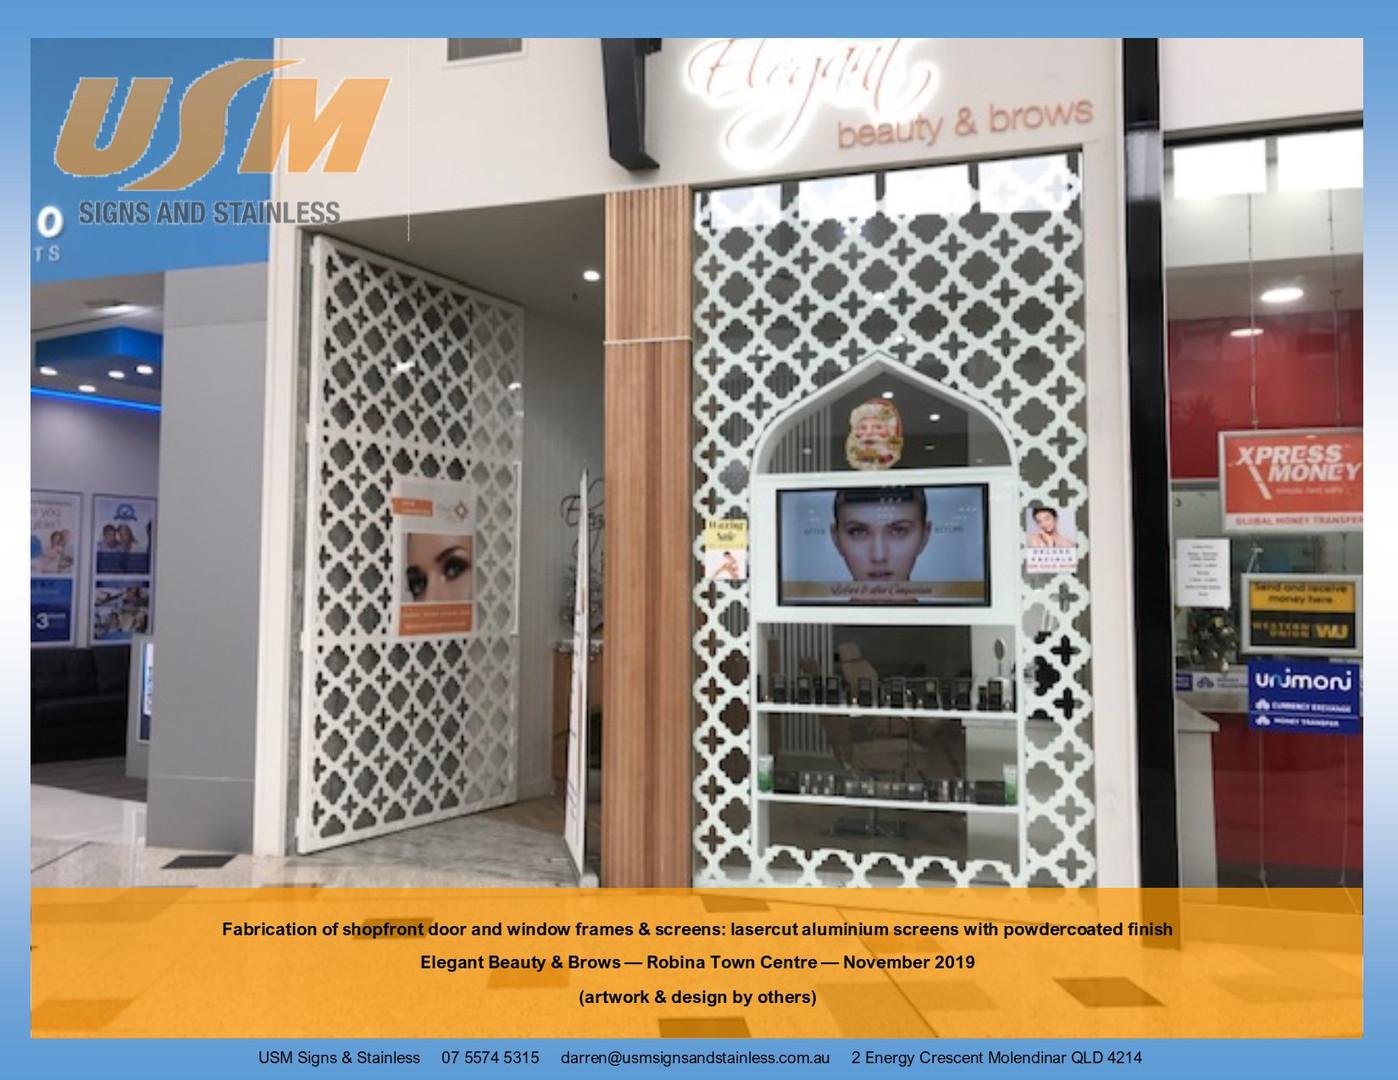 Beauty & Brows Shopfront